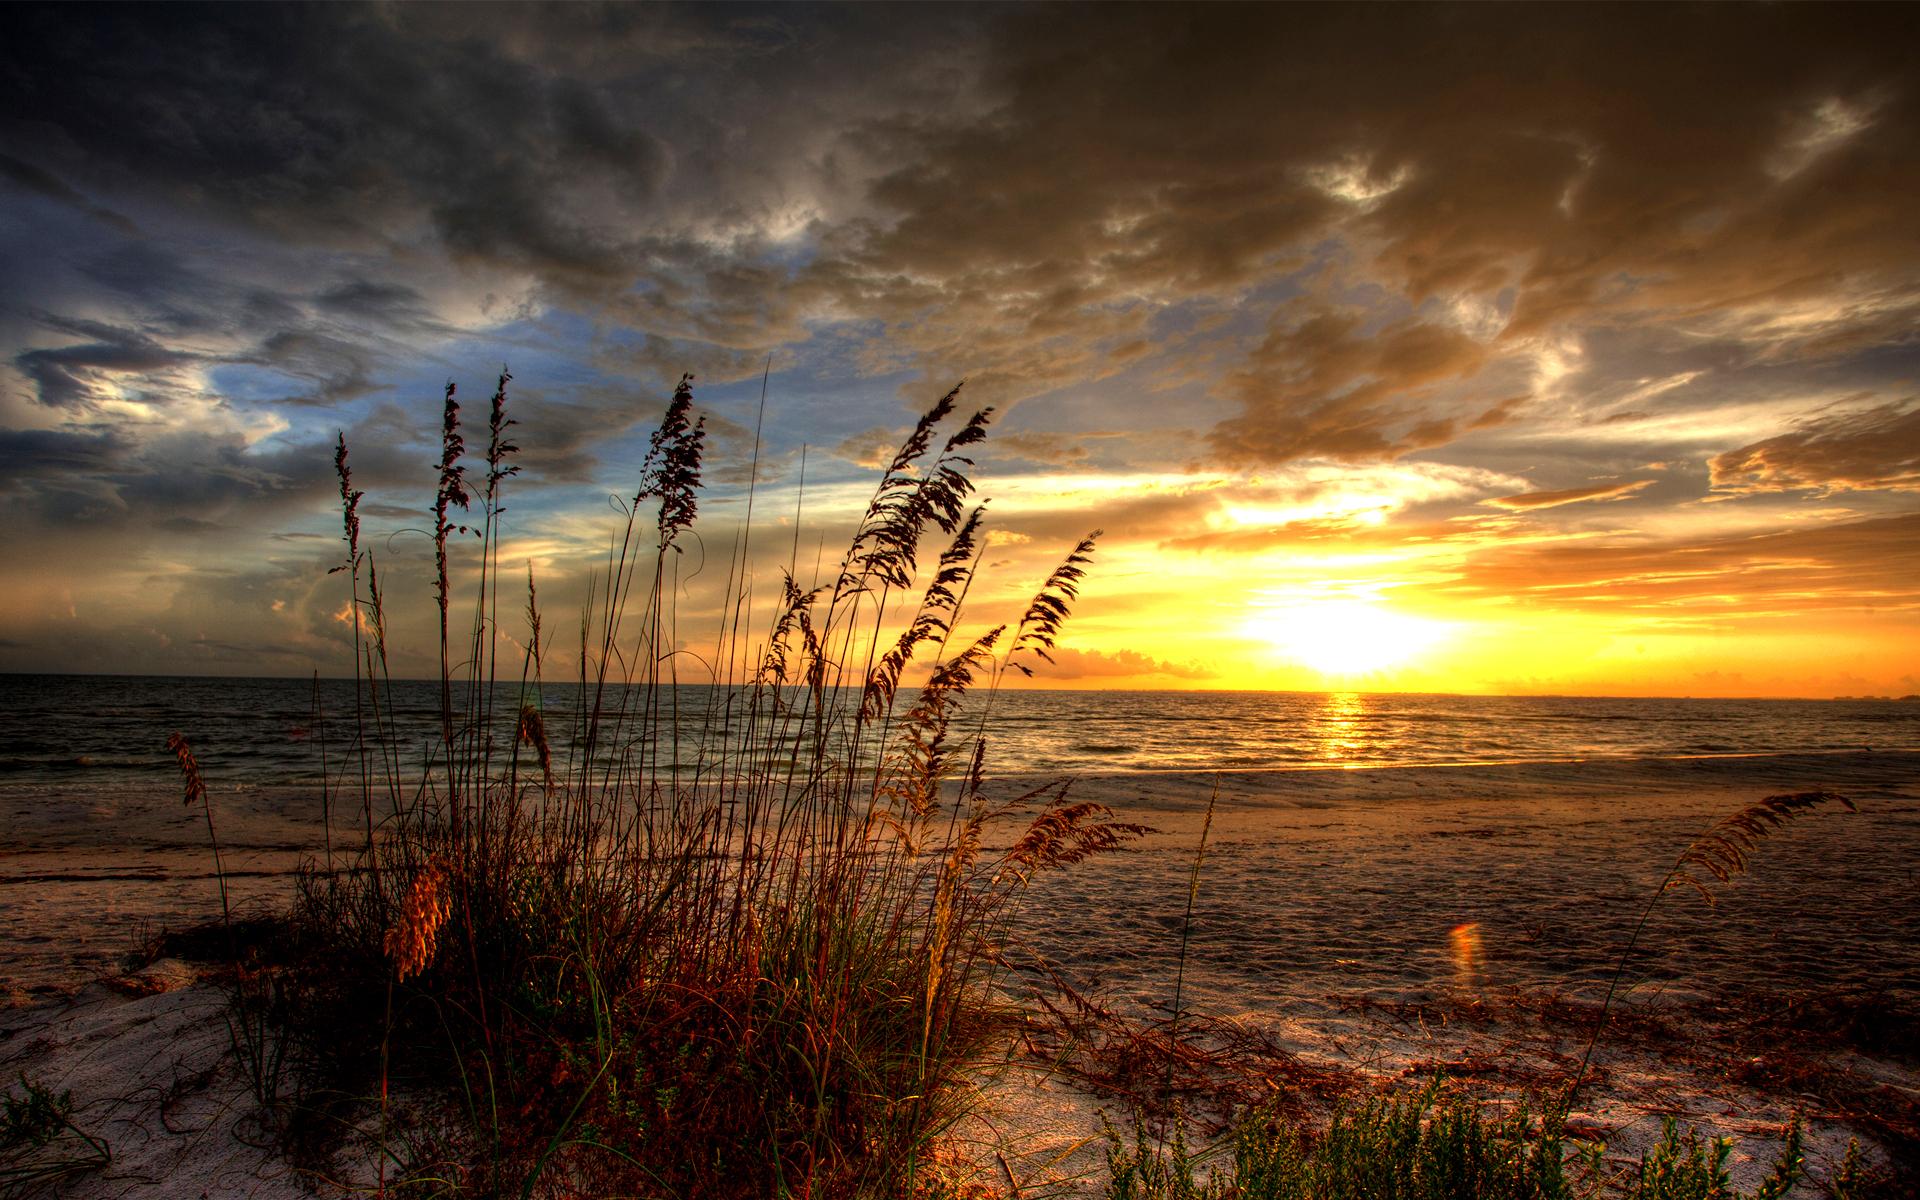 Sunrise Landscape Scenic HDR Ocean Beach Sand Cloud Sun Wallpaper 1920x1200